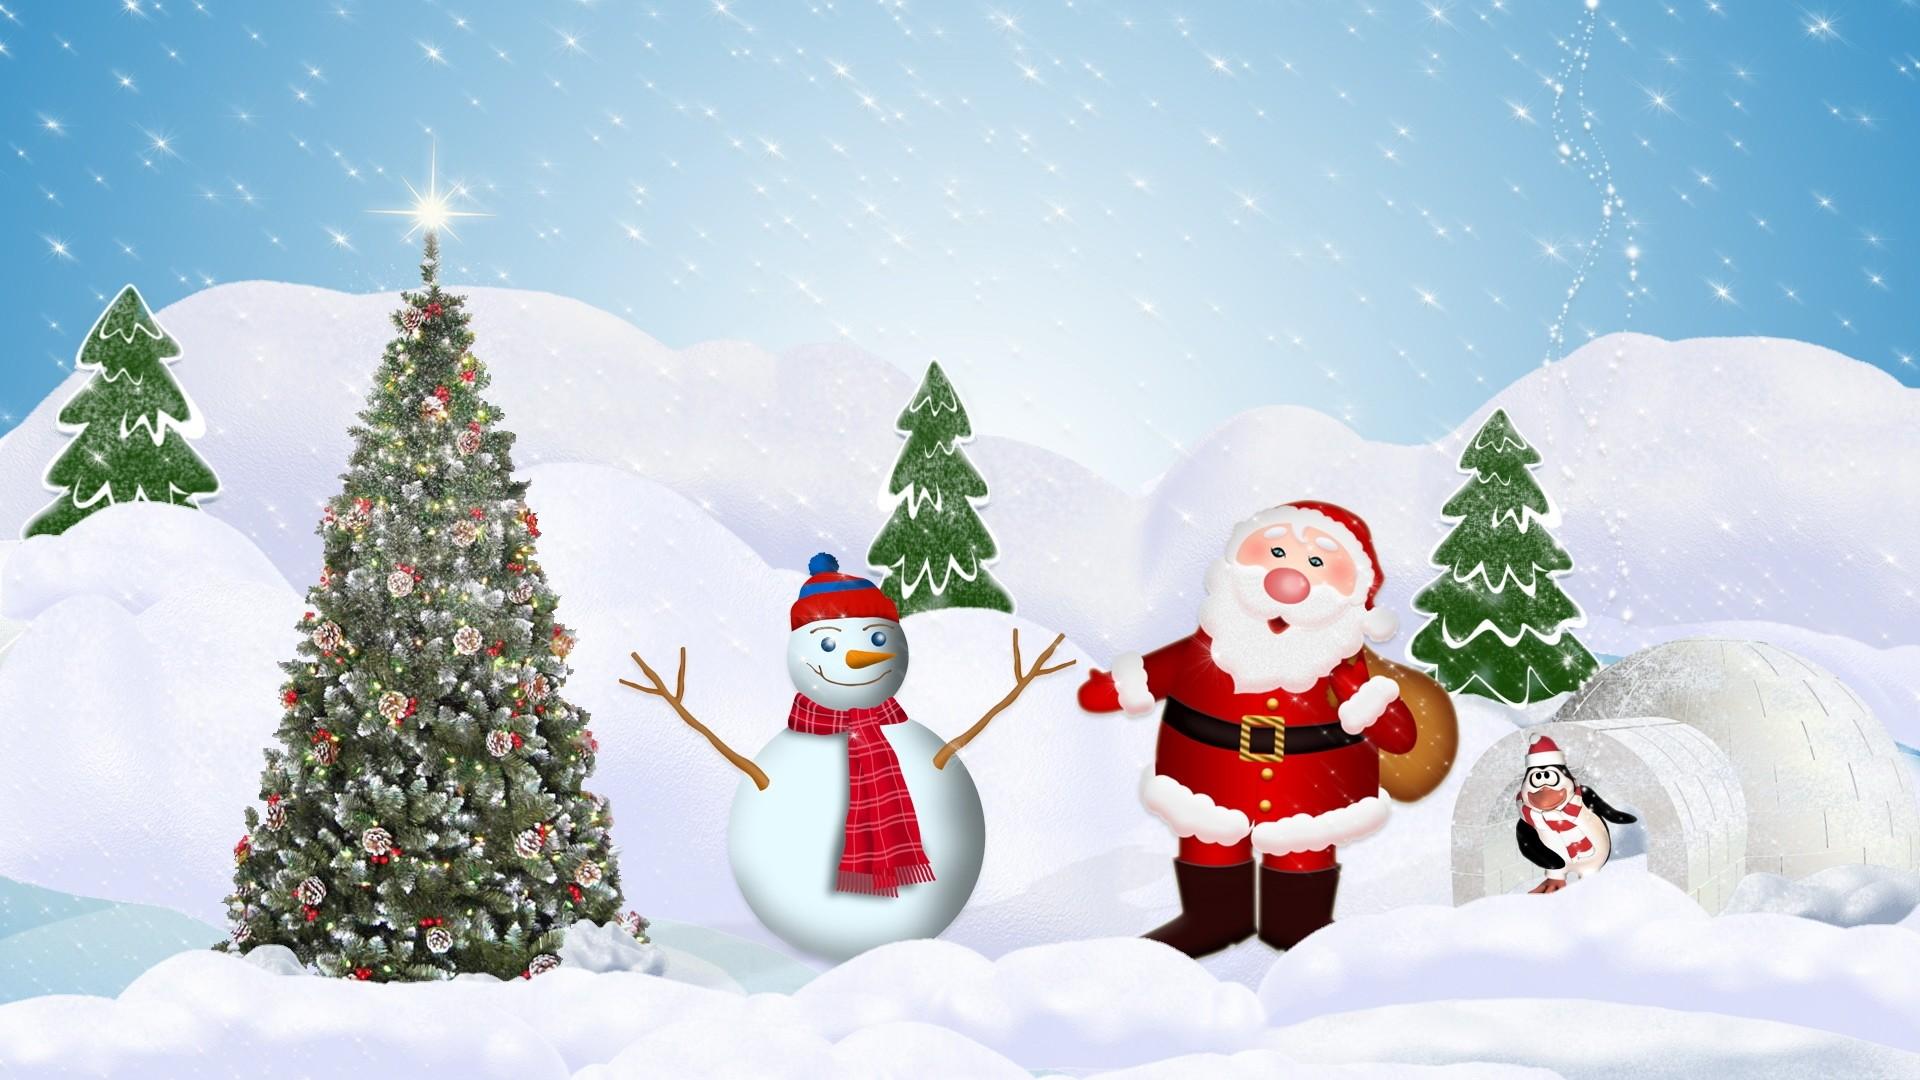 Santa Claus Wallpaper (68+ Images